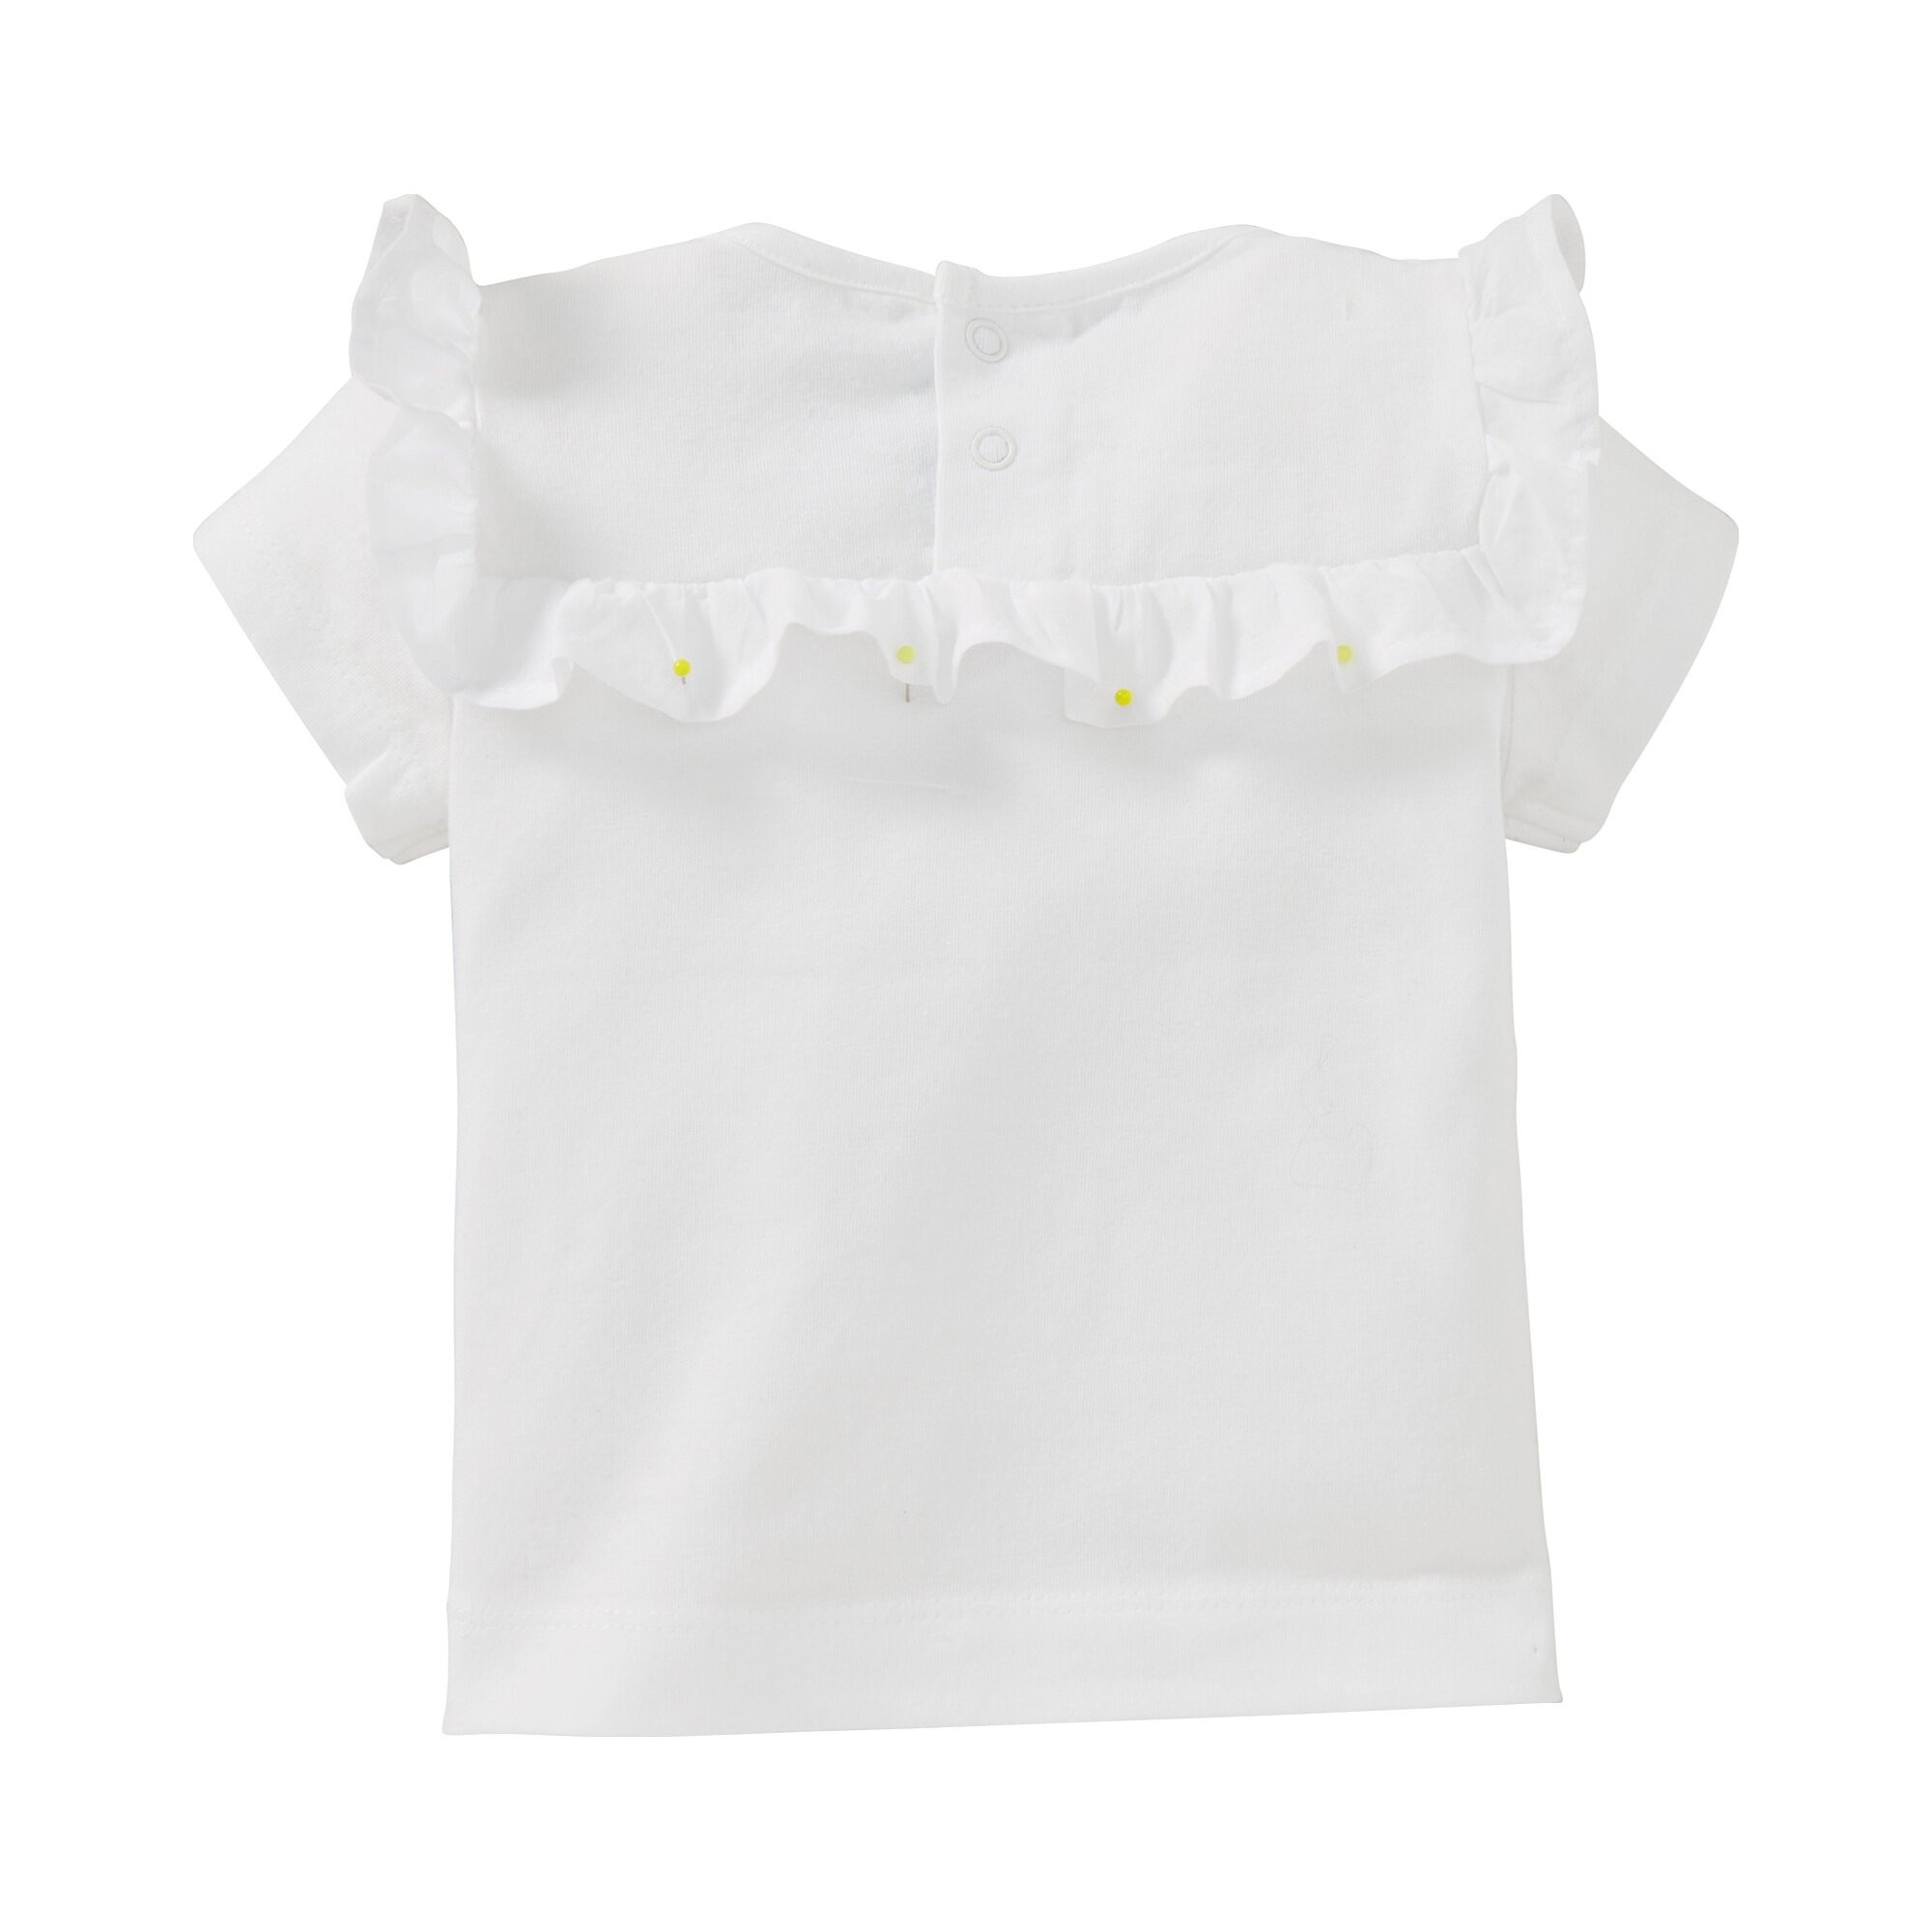 mayoral-t-shirt-ruschen